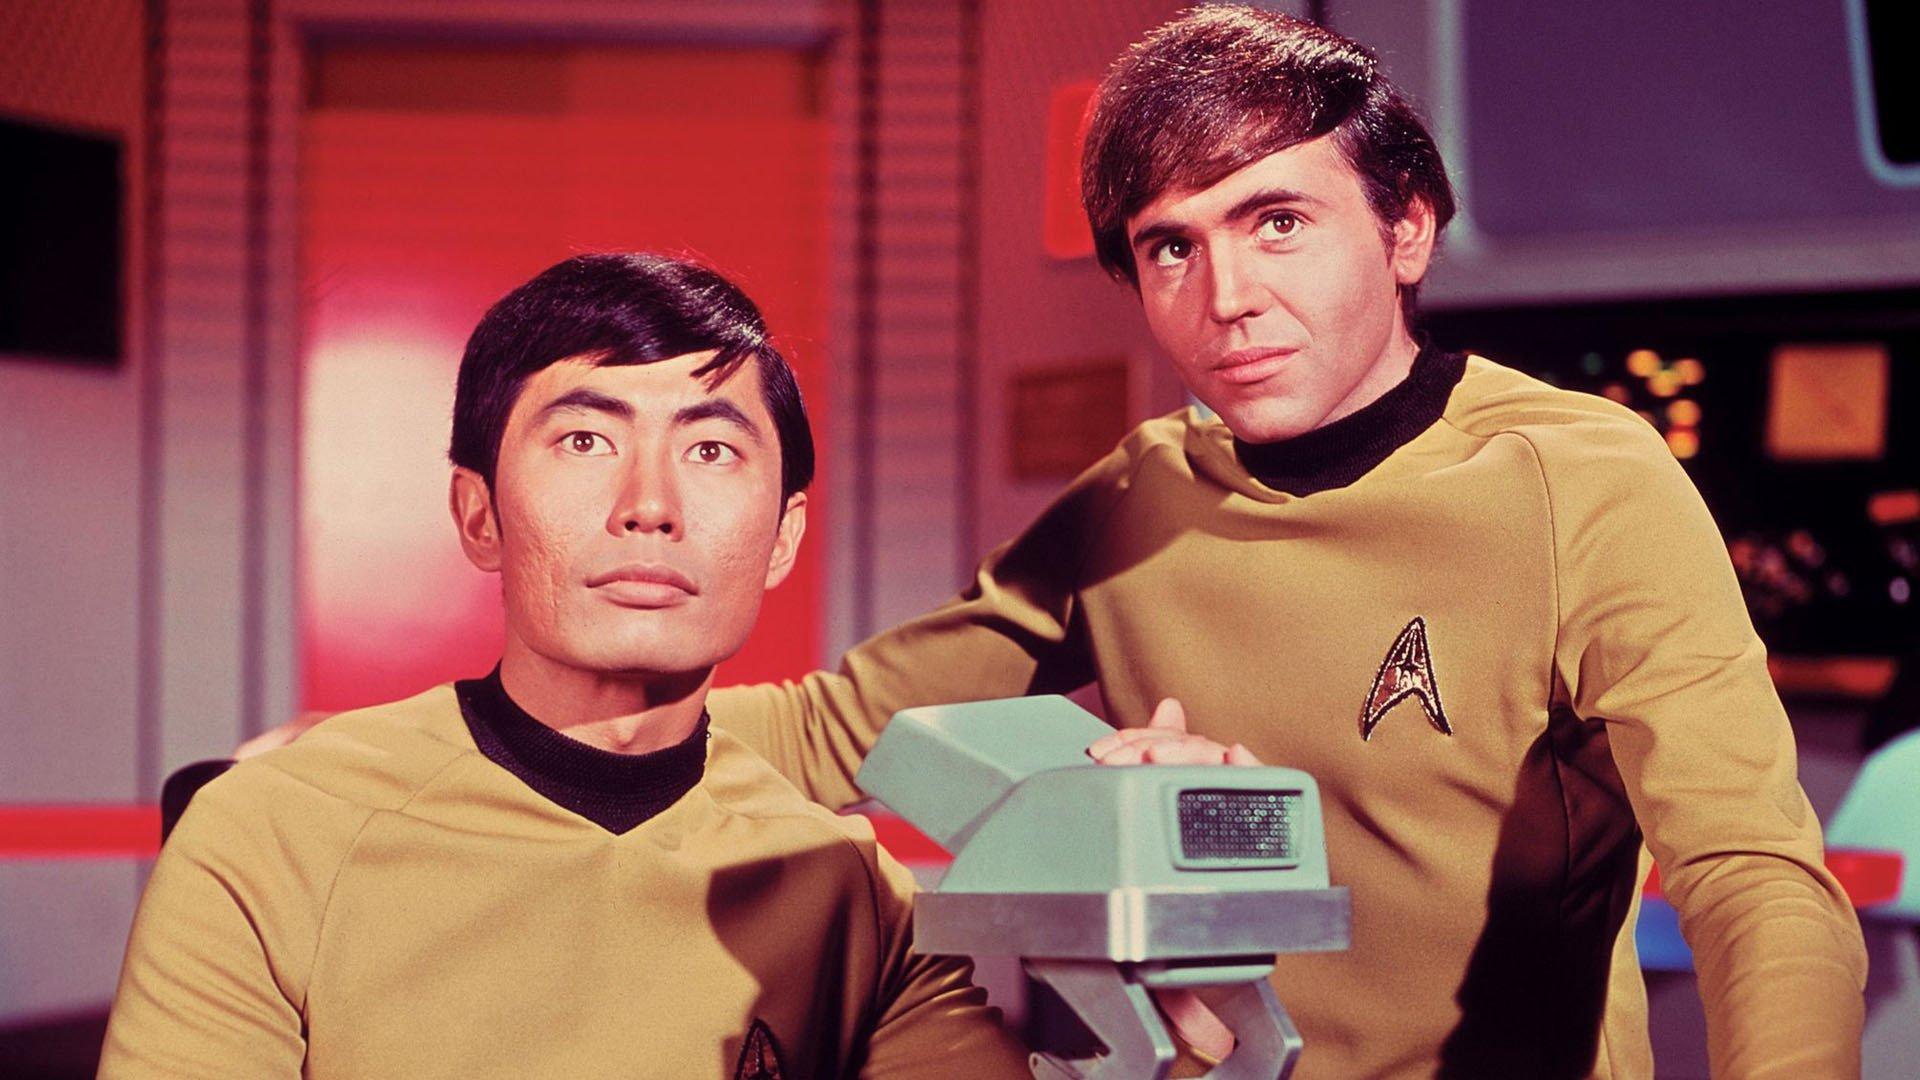 Star Trek The Original Series Wallpapers Pictures Images